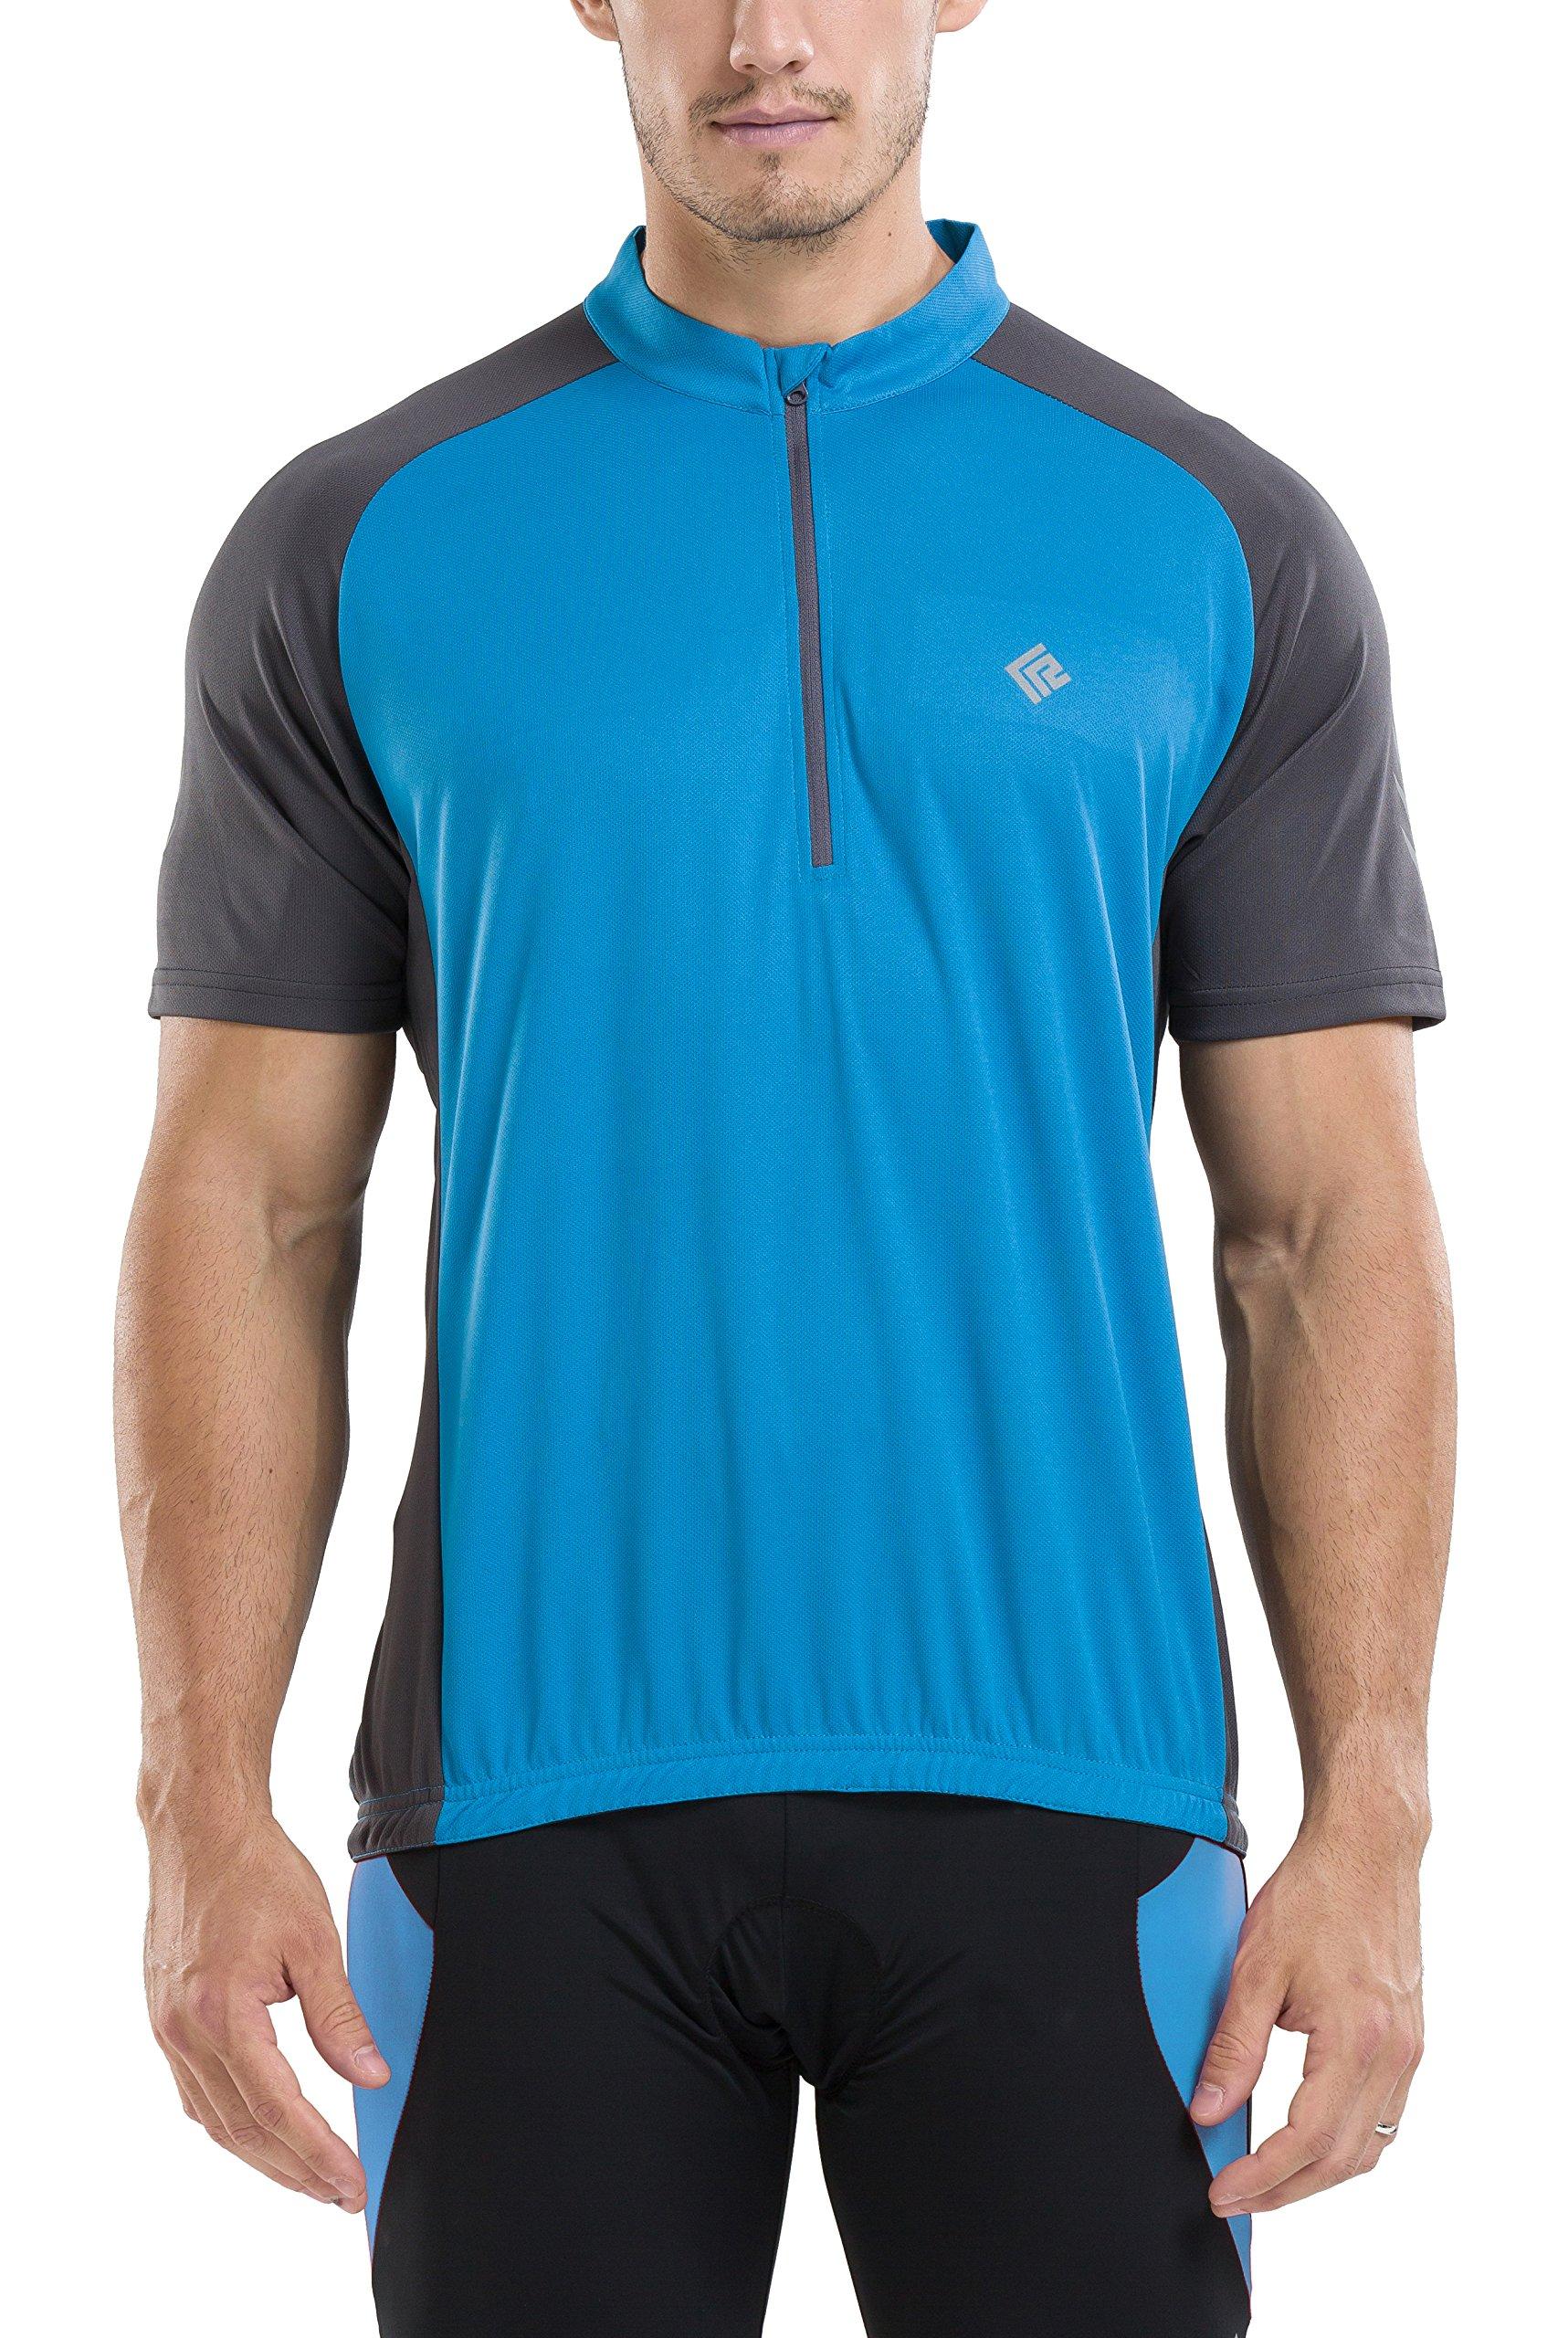 KORAMAN Men's Reflective Short Sleeve Cycling Jersey with Zipper Pocket